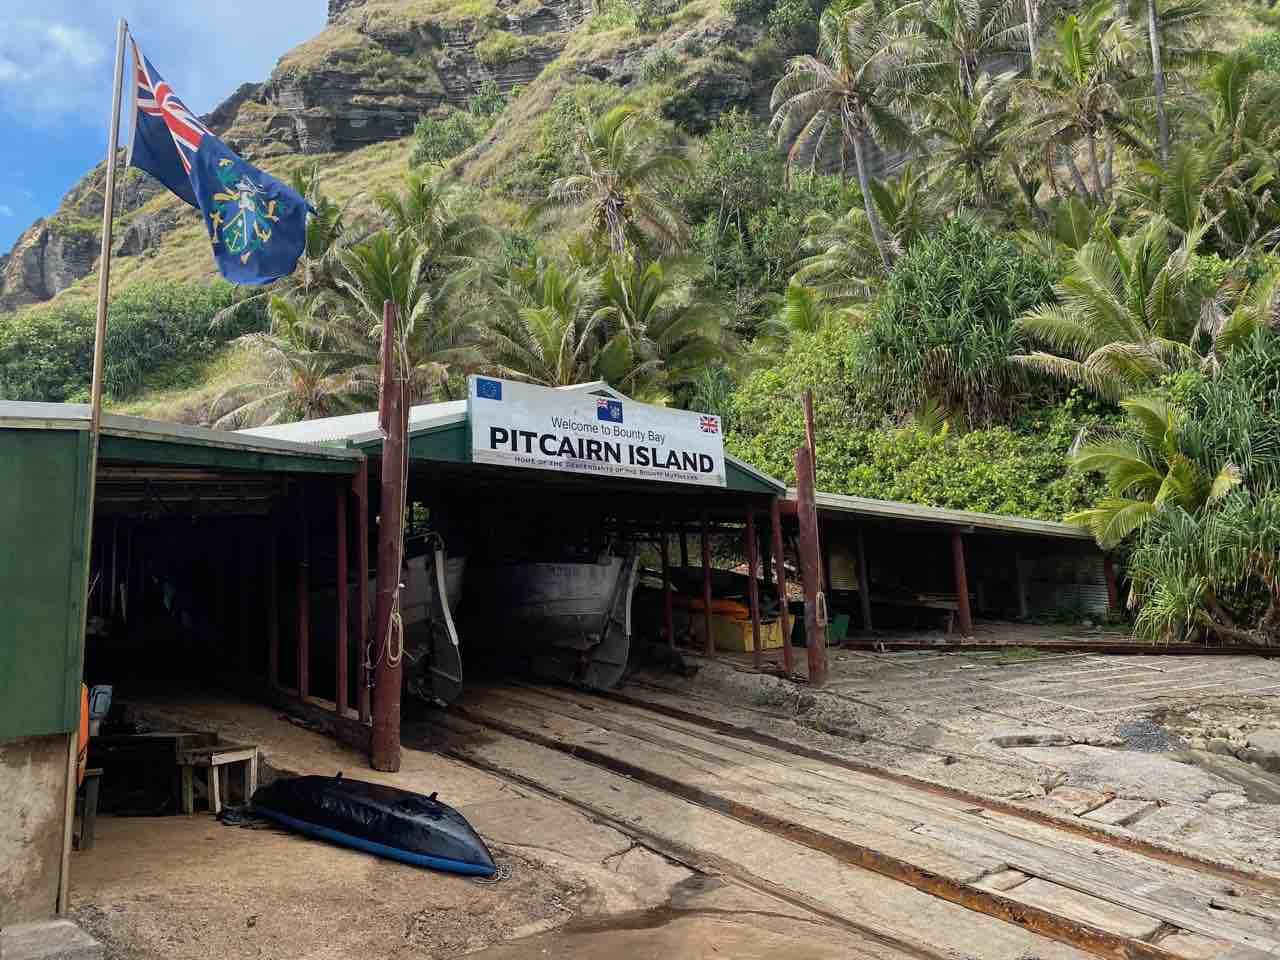 26 February 2020 Bounty Island Pitcairn Sailors For Sustainability